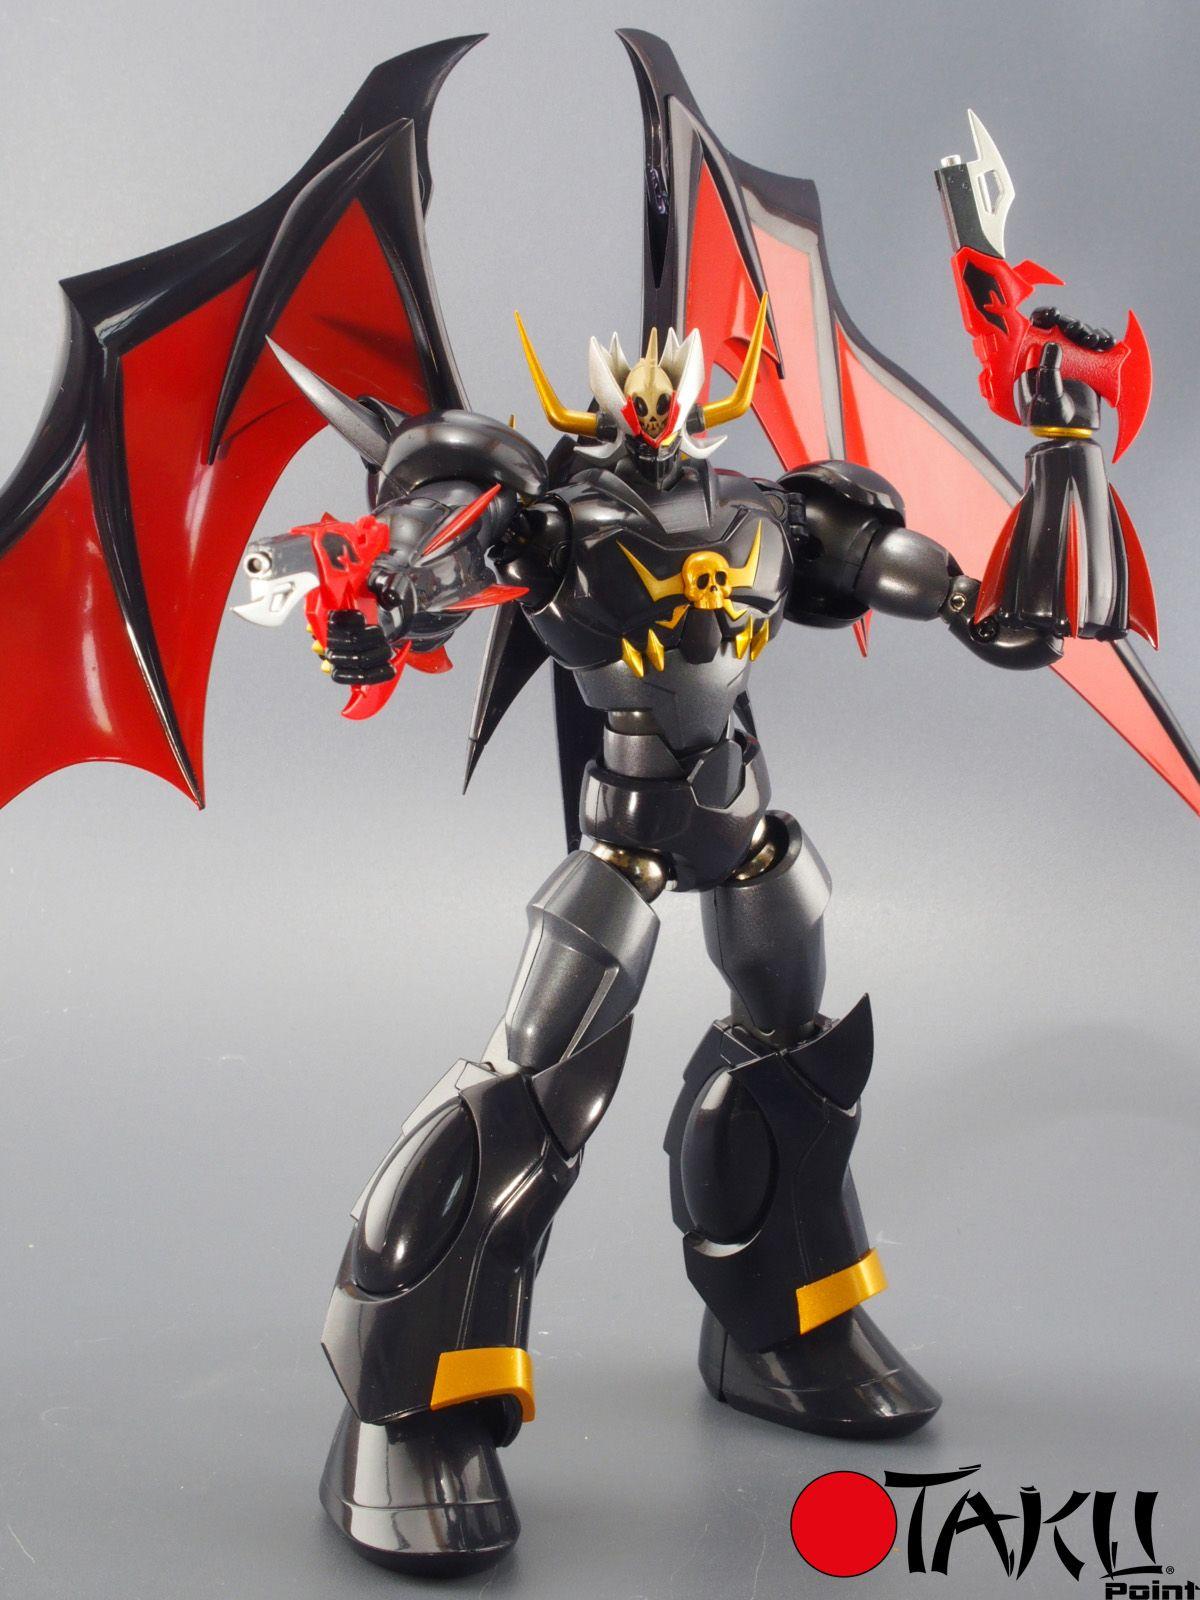 Bandai Chogokin Mazinkaiser SKL Final Count Super Robot Chogokin Action Figure